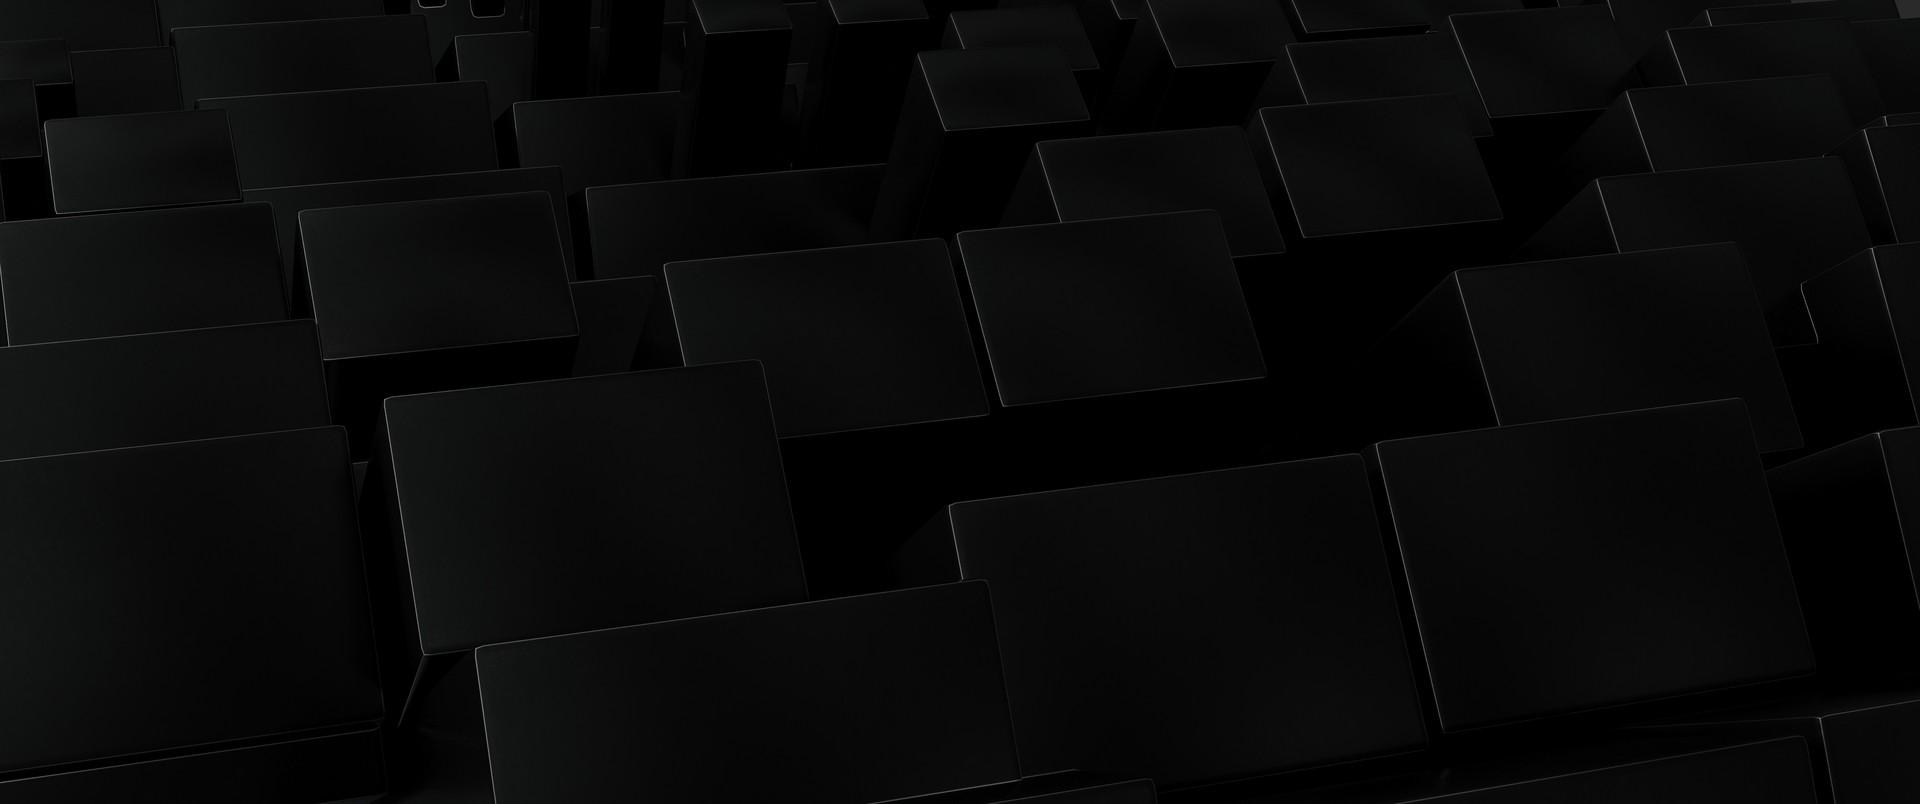 Kresimir jelusic robob3ar 494 abstract box 21 6k